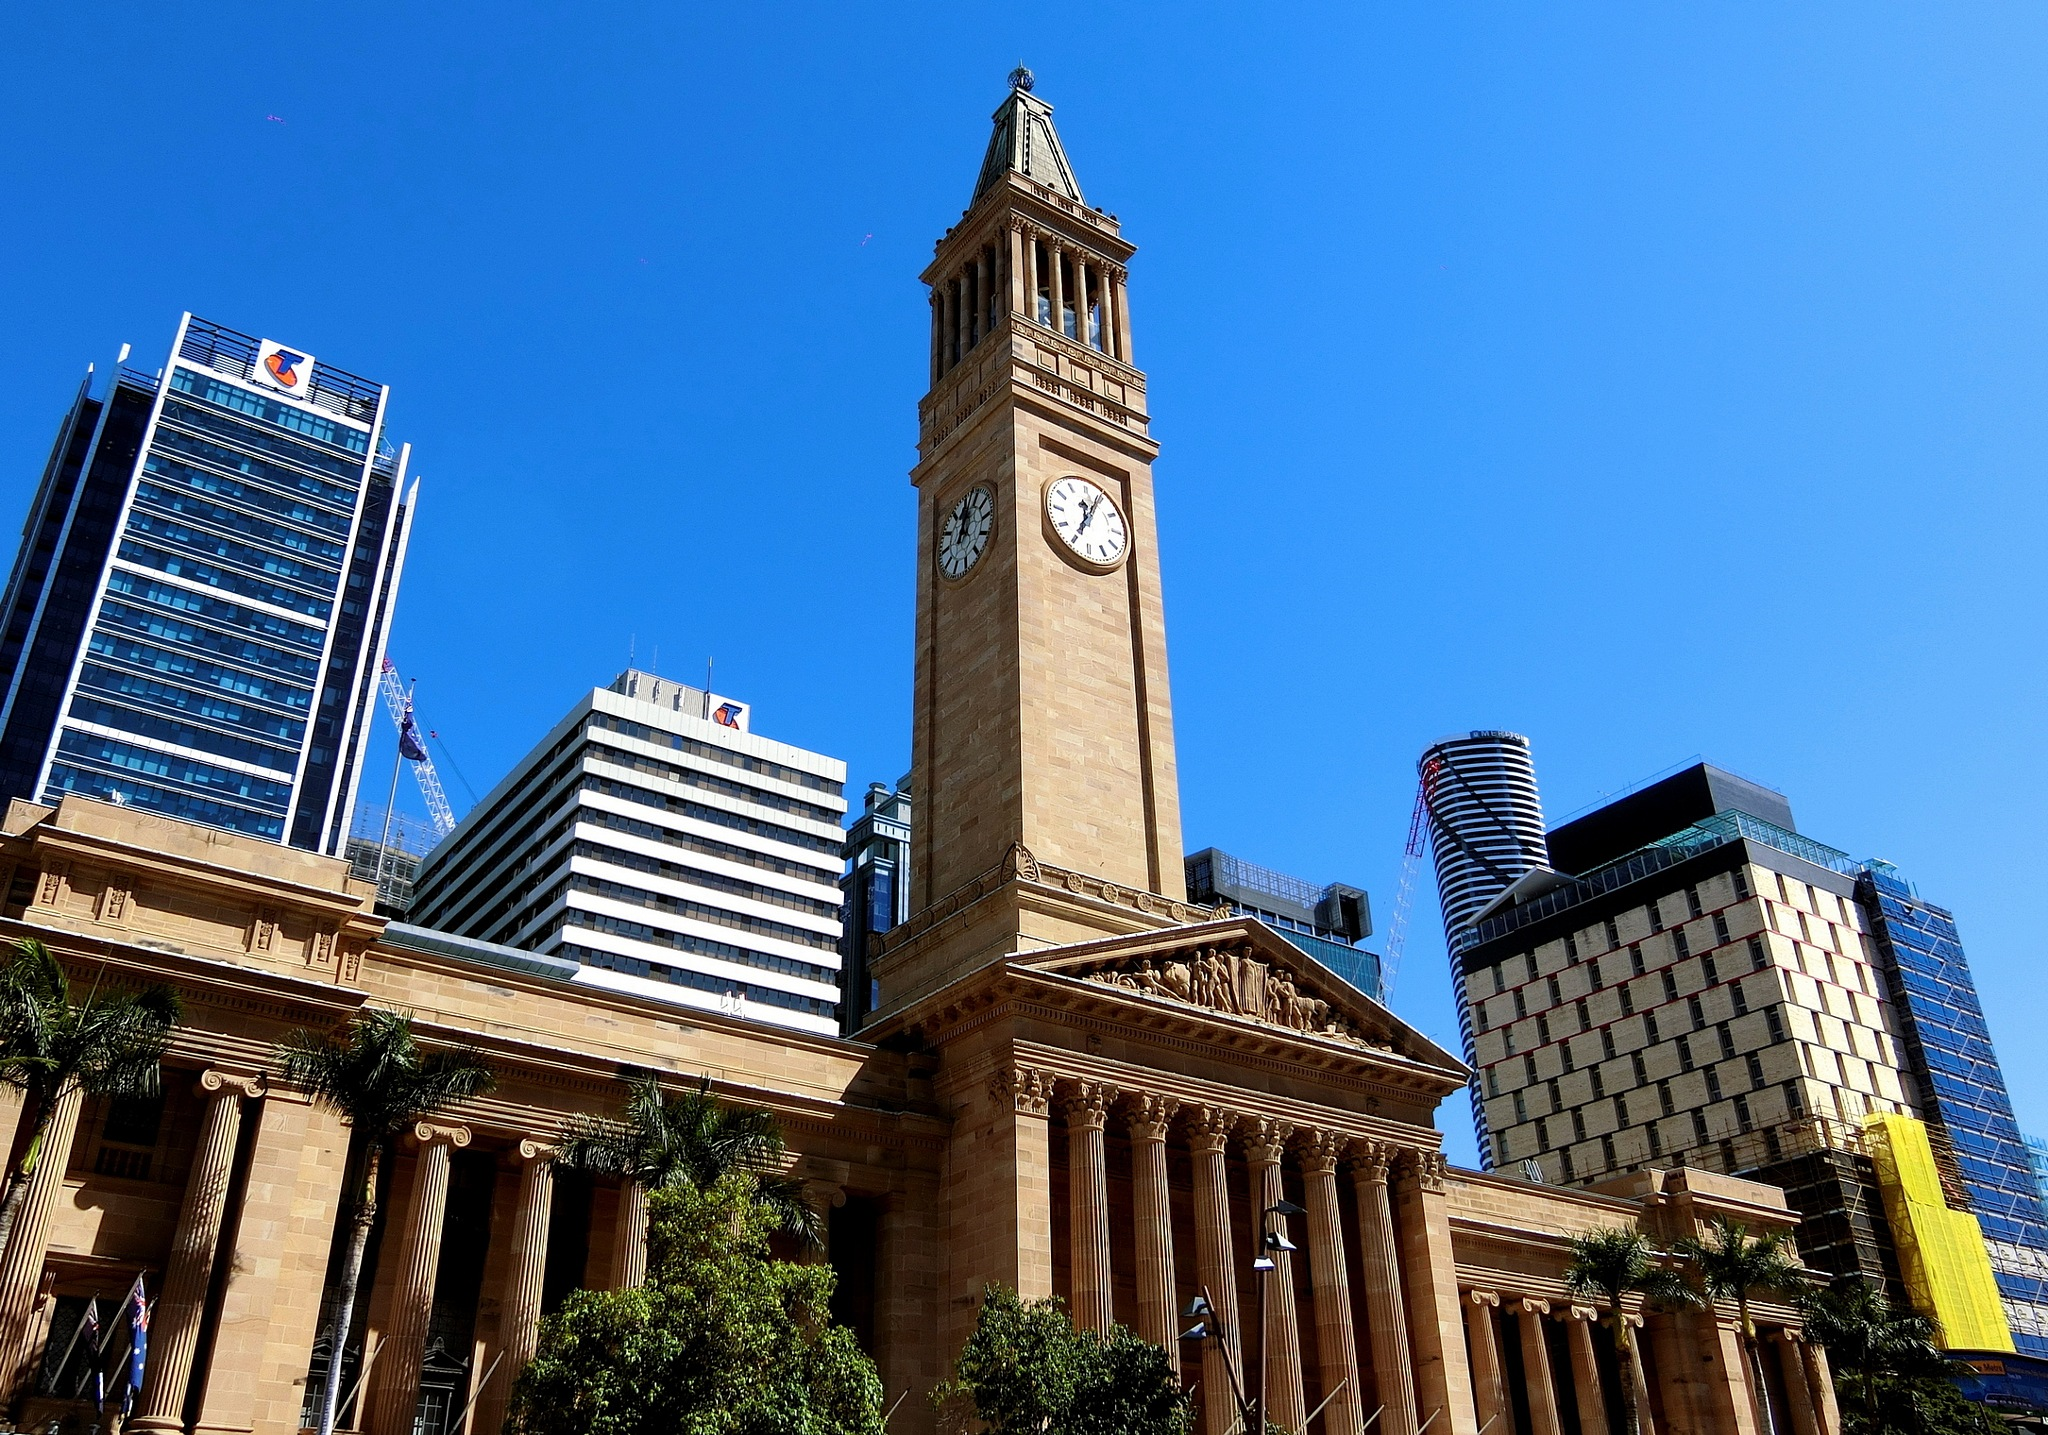 Brisbane city buildings-3 by pop88123